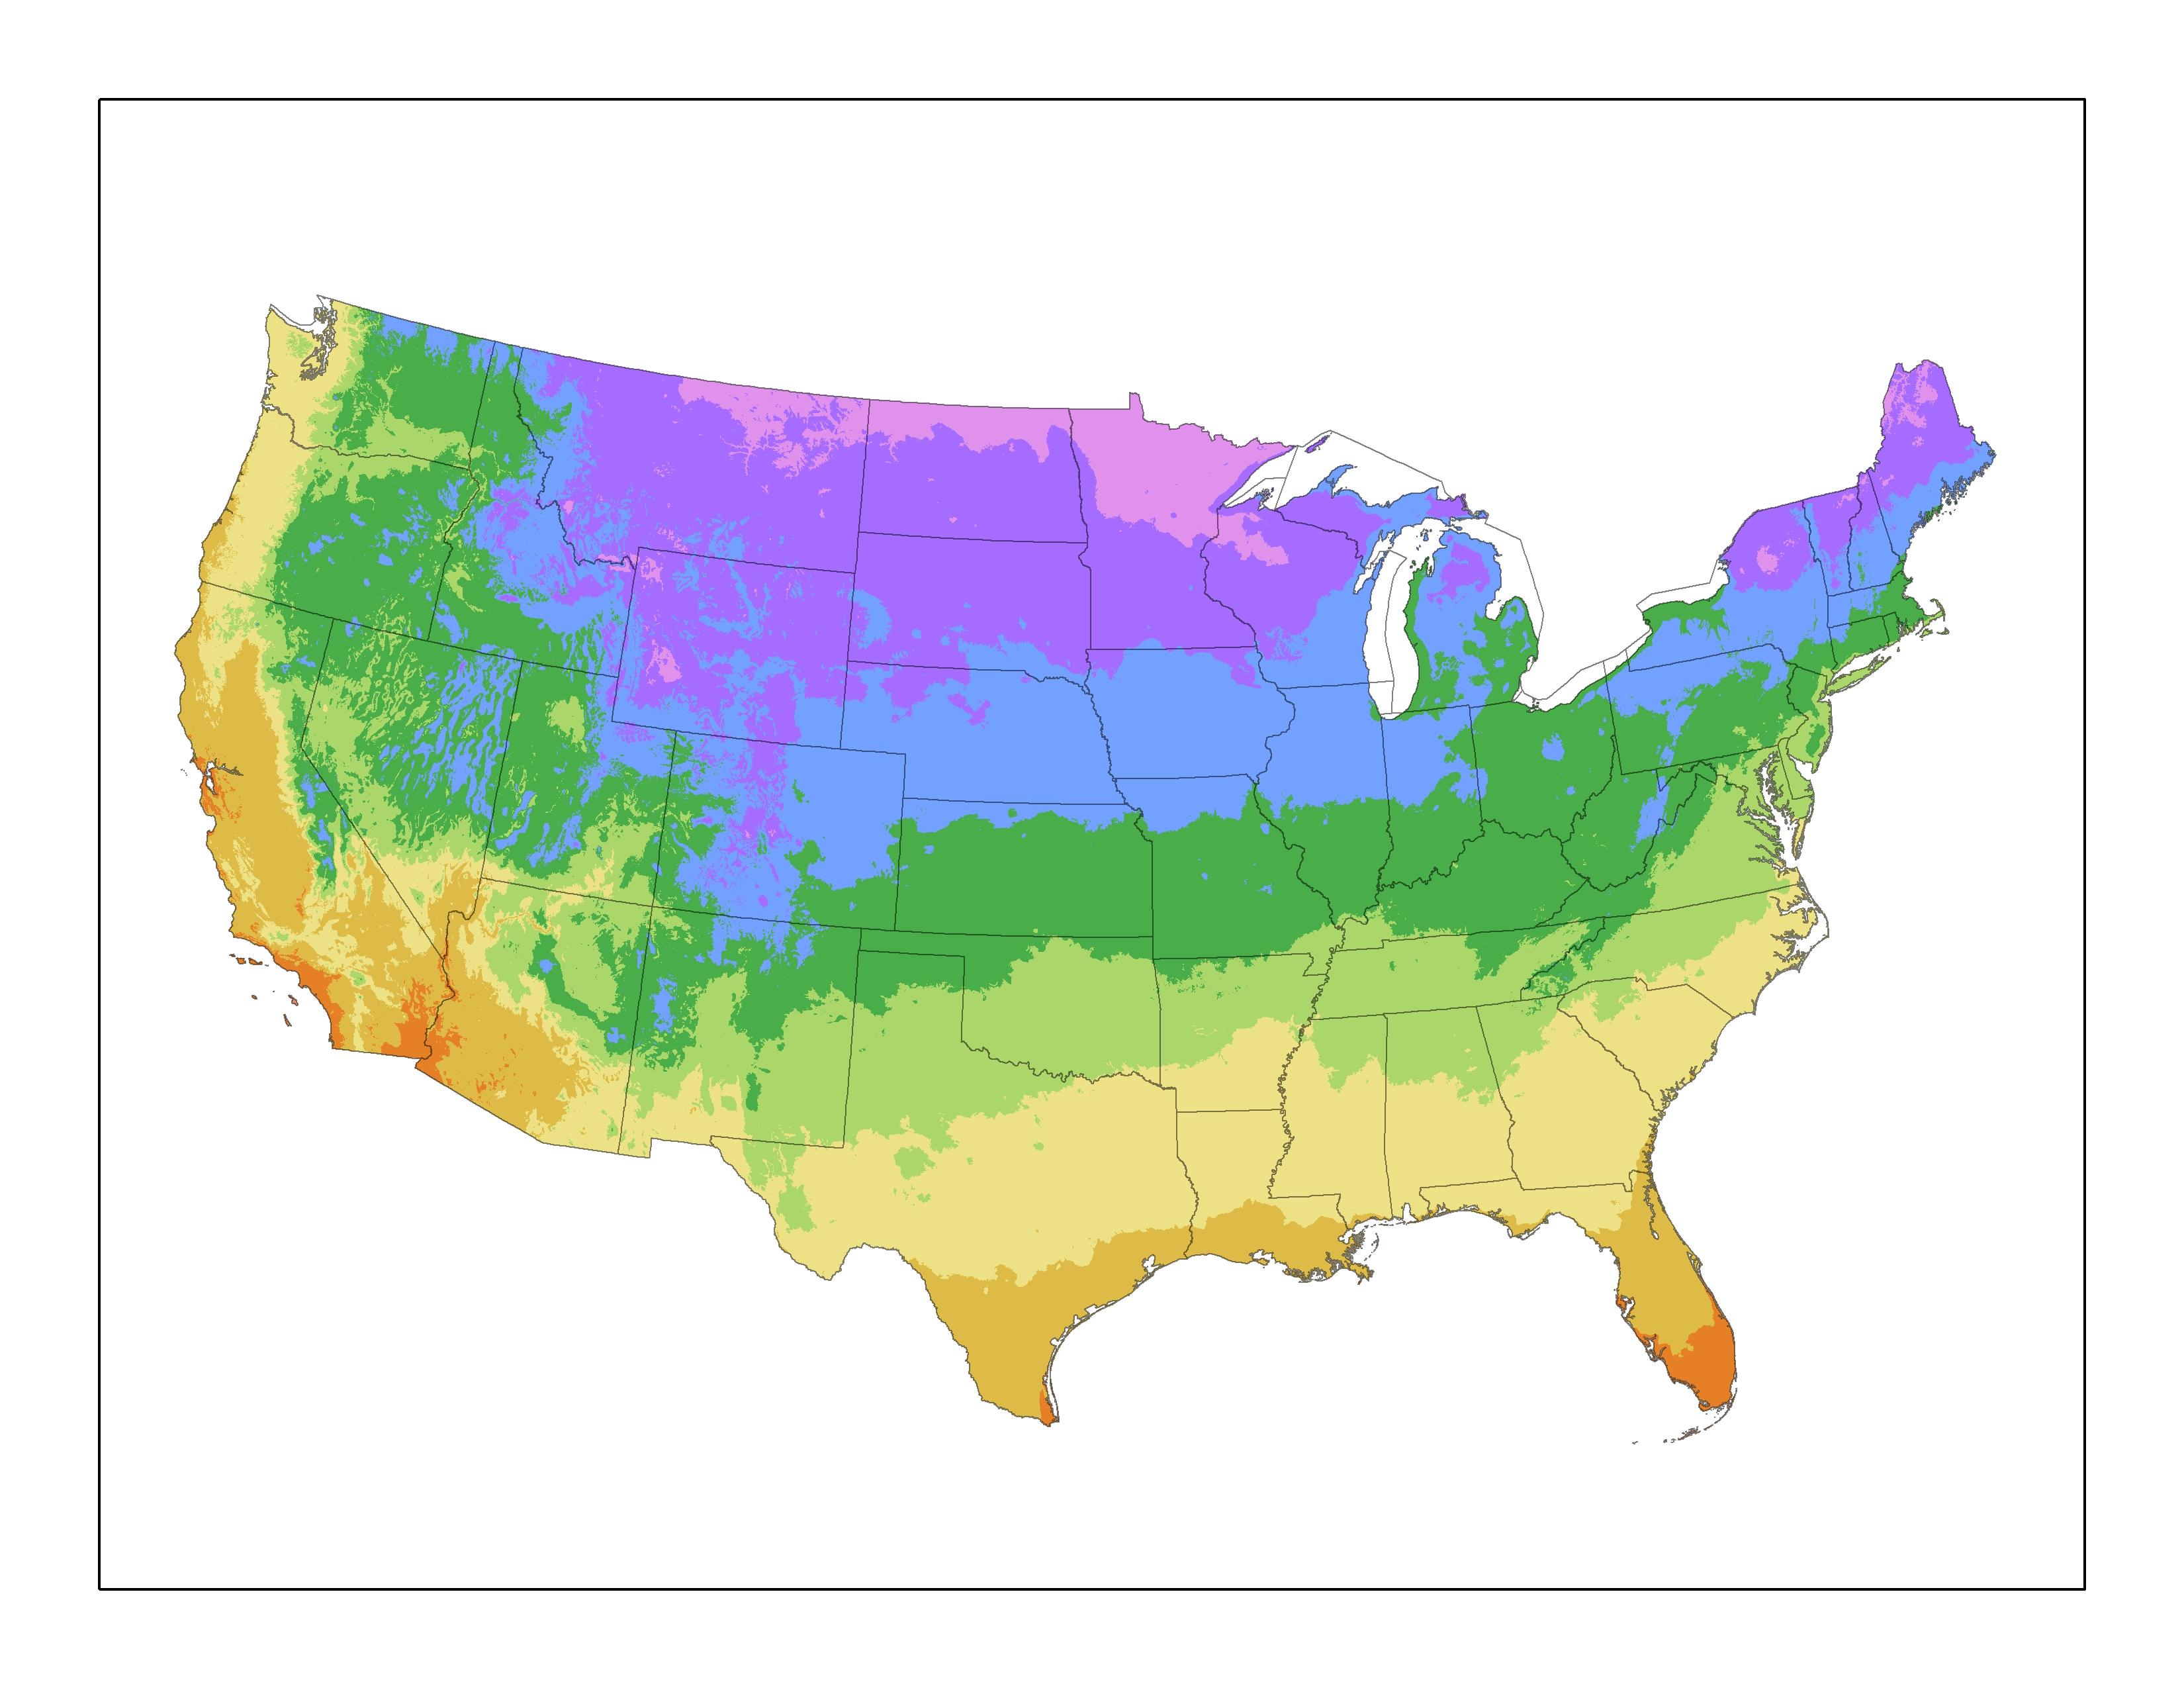 United States Plant Zone Map